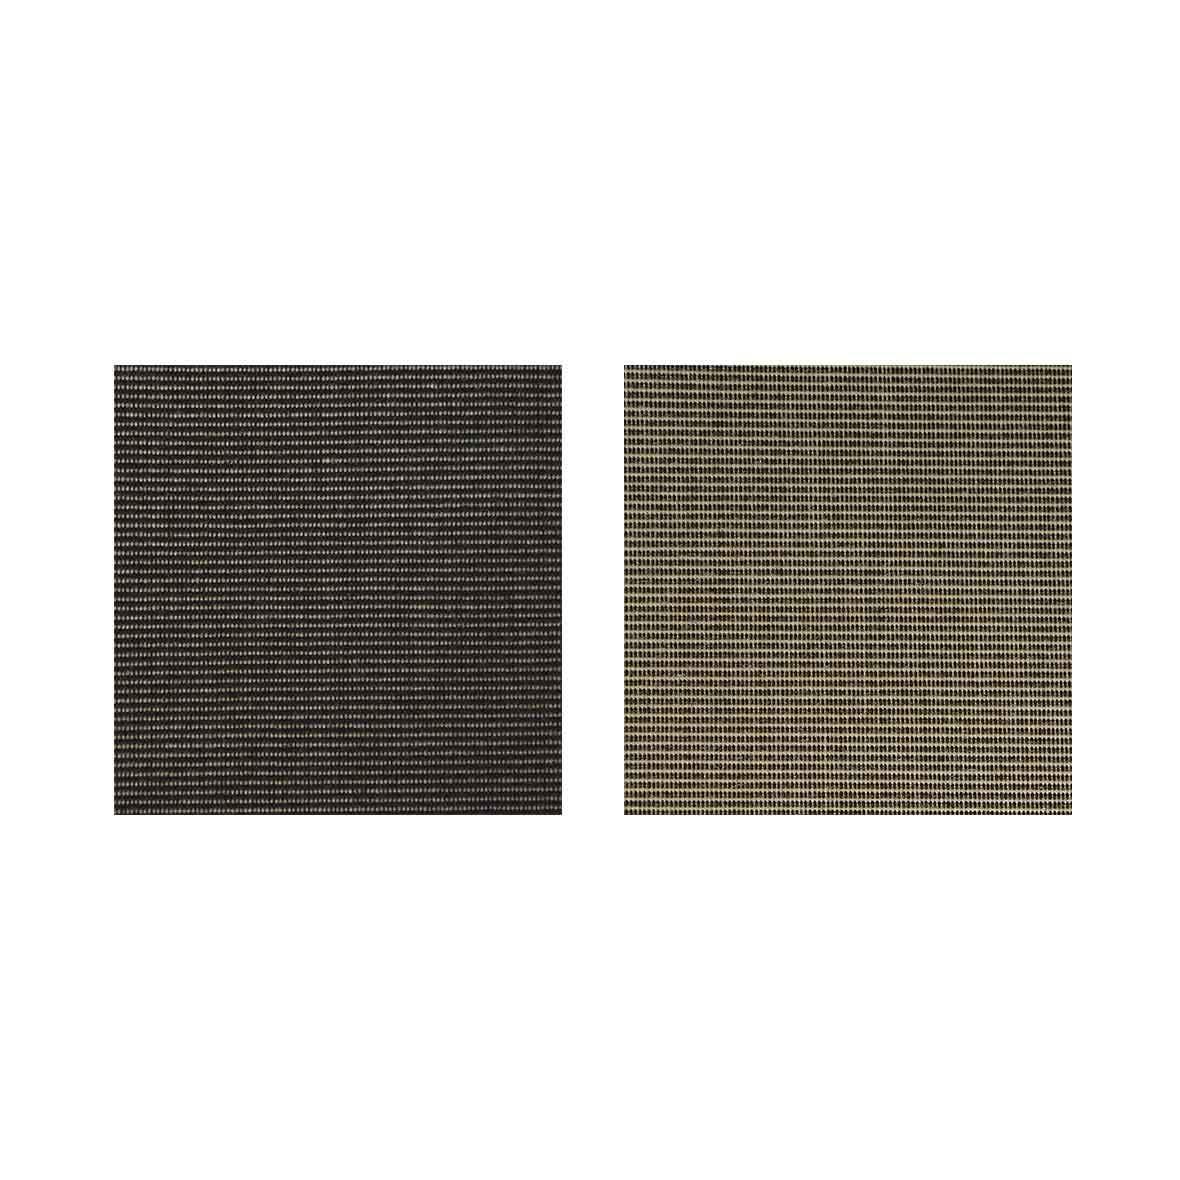 Farbmuster Liegestuhl Hocker-Set von Contact Arbeit Holz + Textil